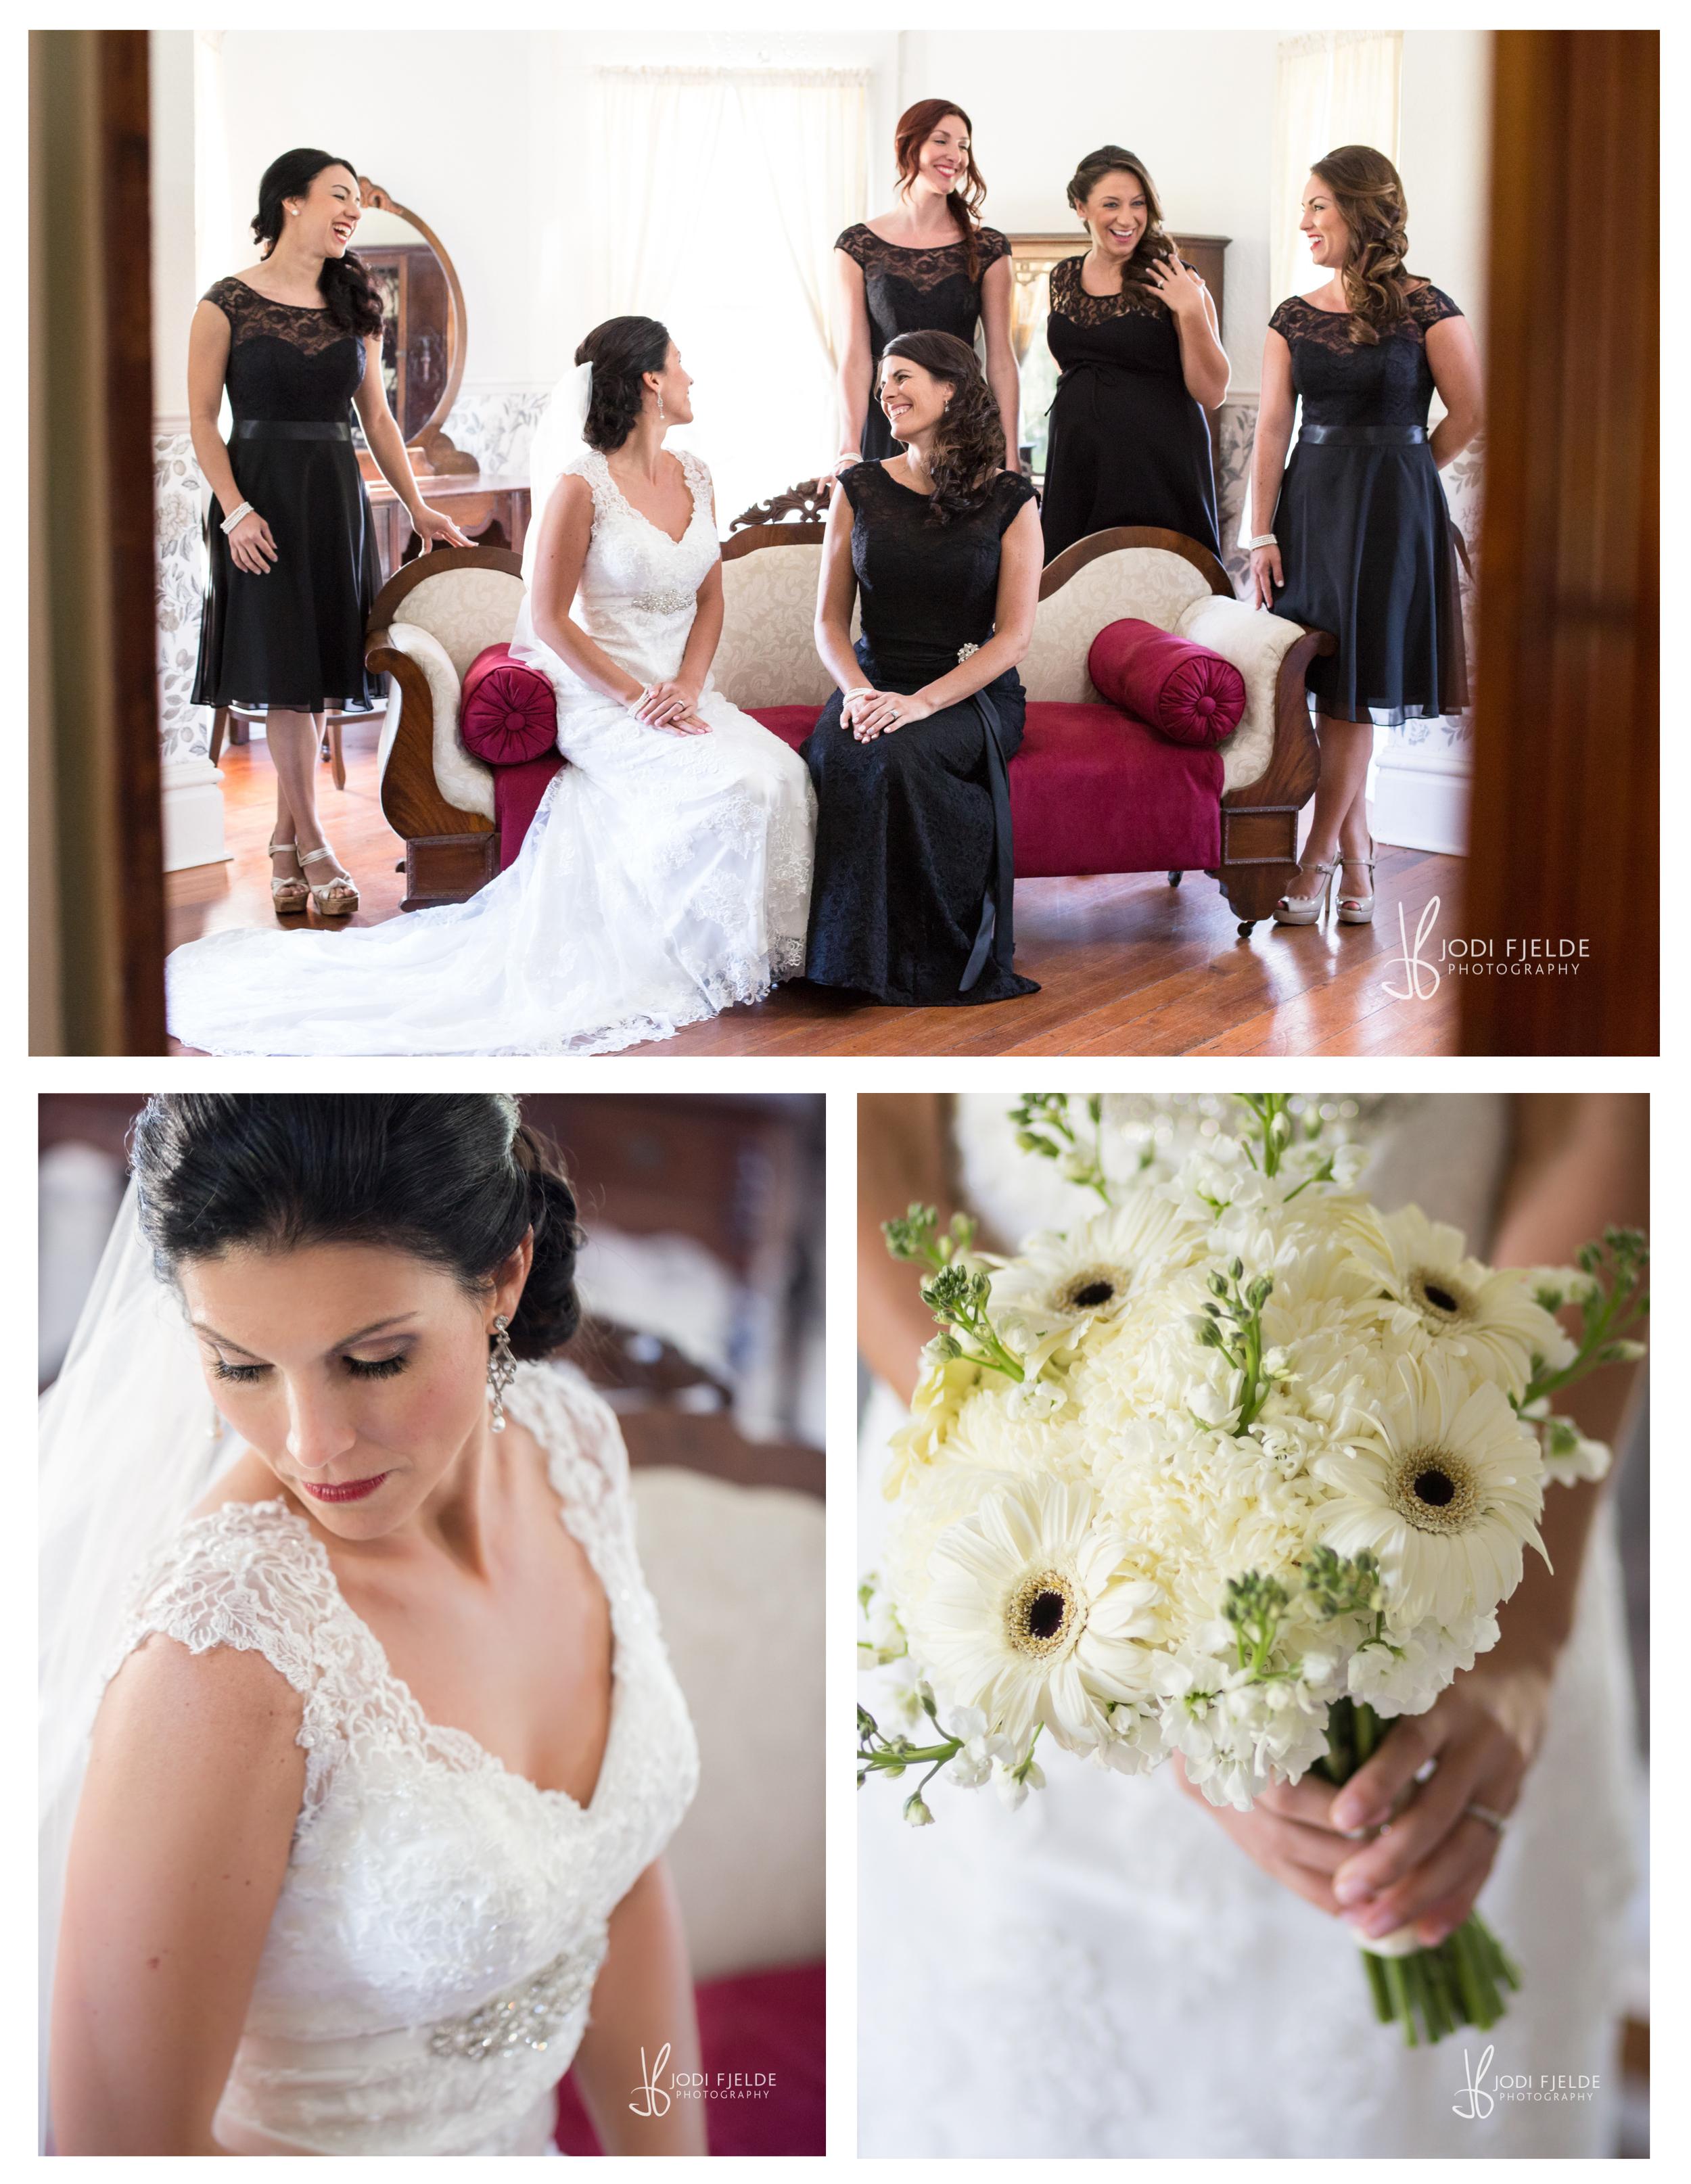 Highland_Manor_Apopka_Florida_wedding_Jackie_&_Tim_photography_jodi_Fjelde_photography-8.jpg